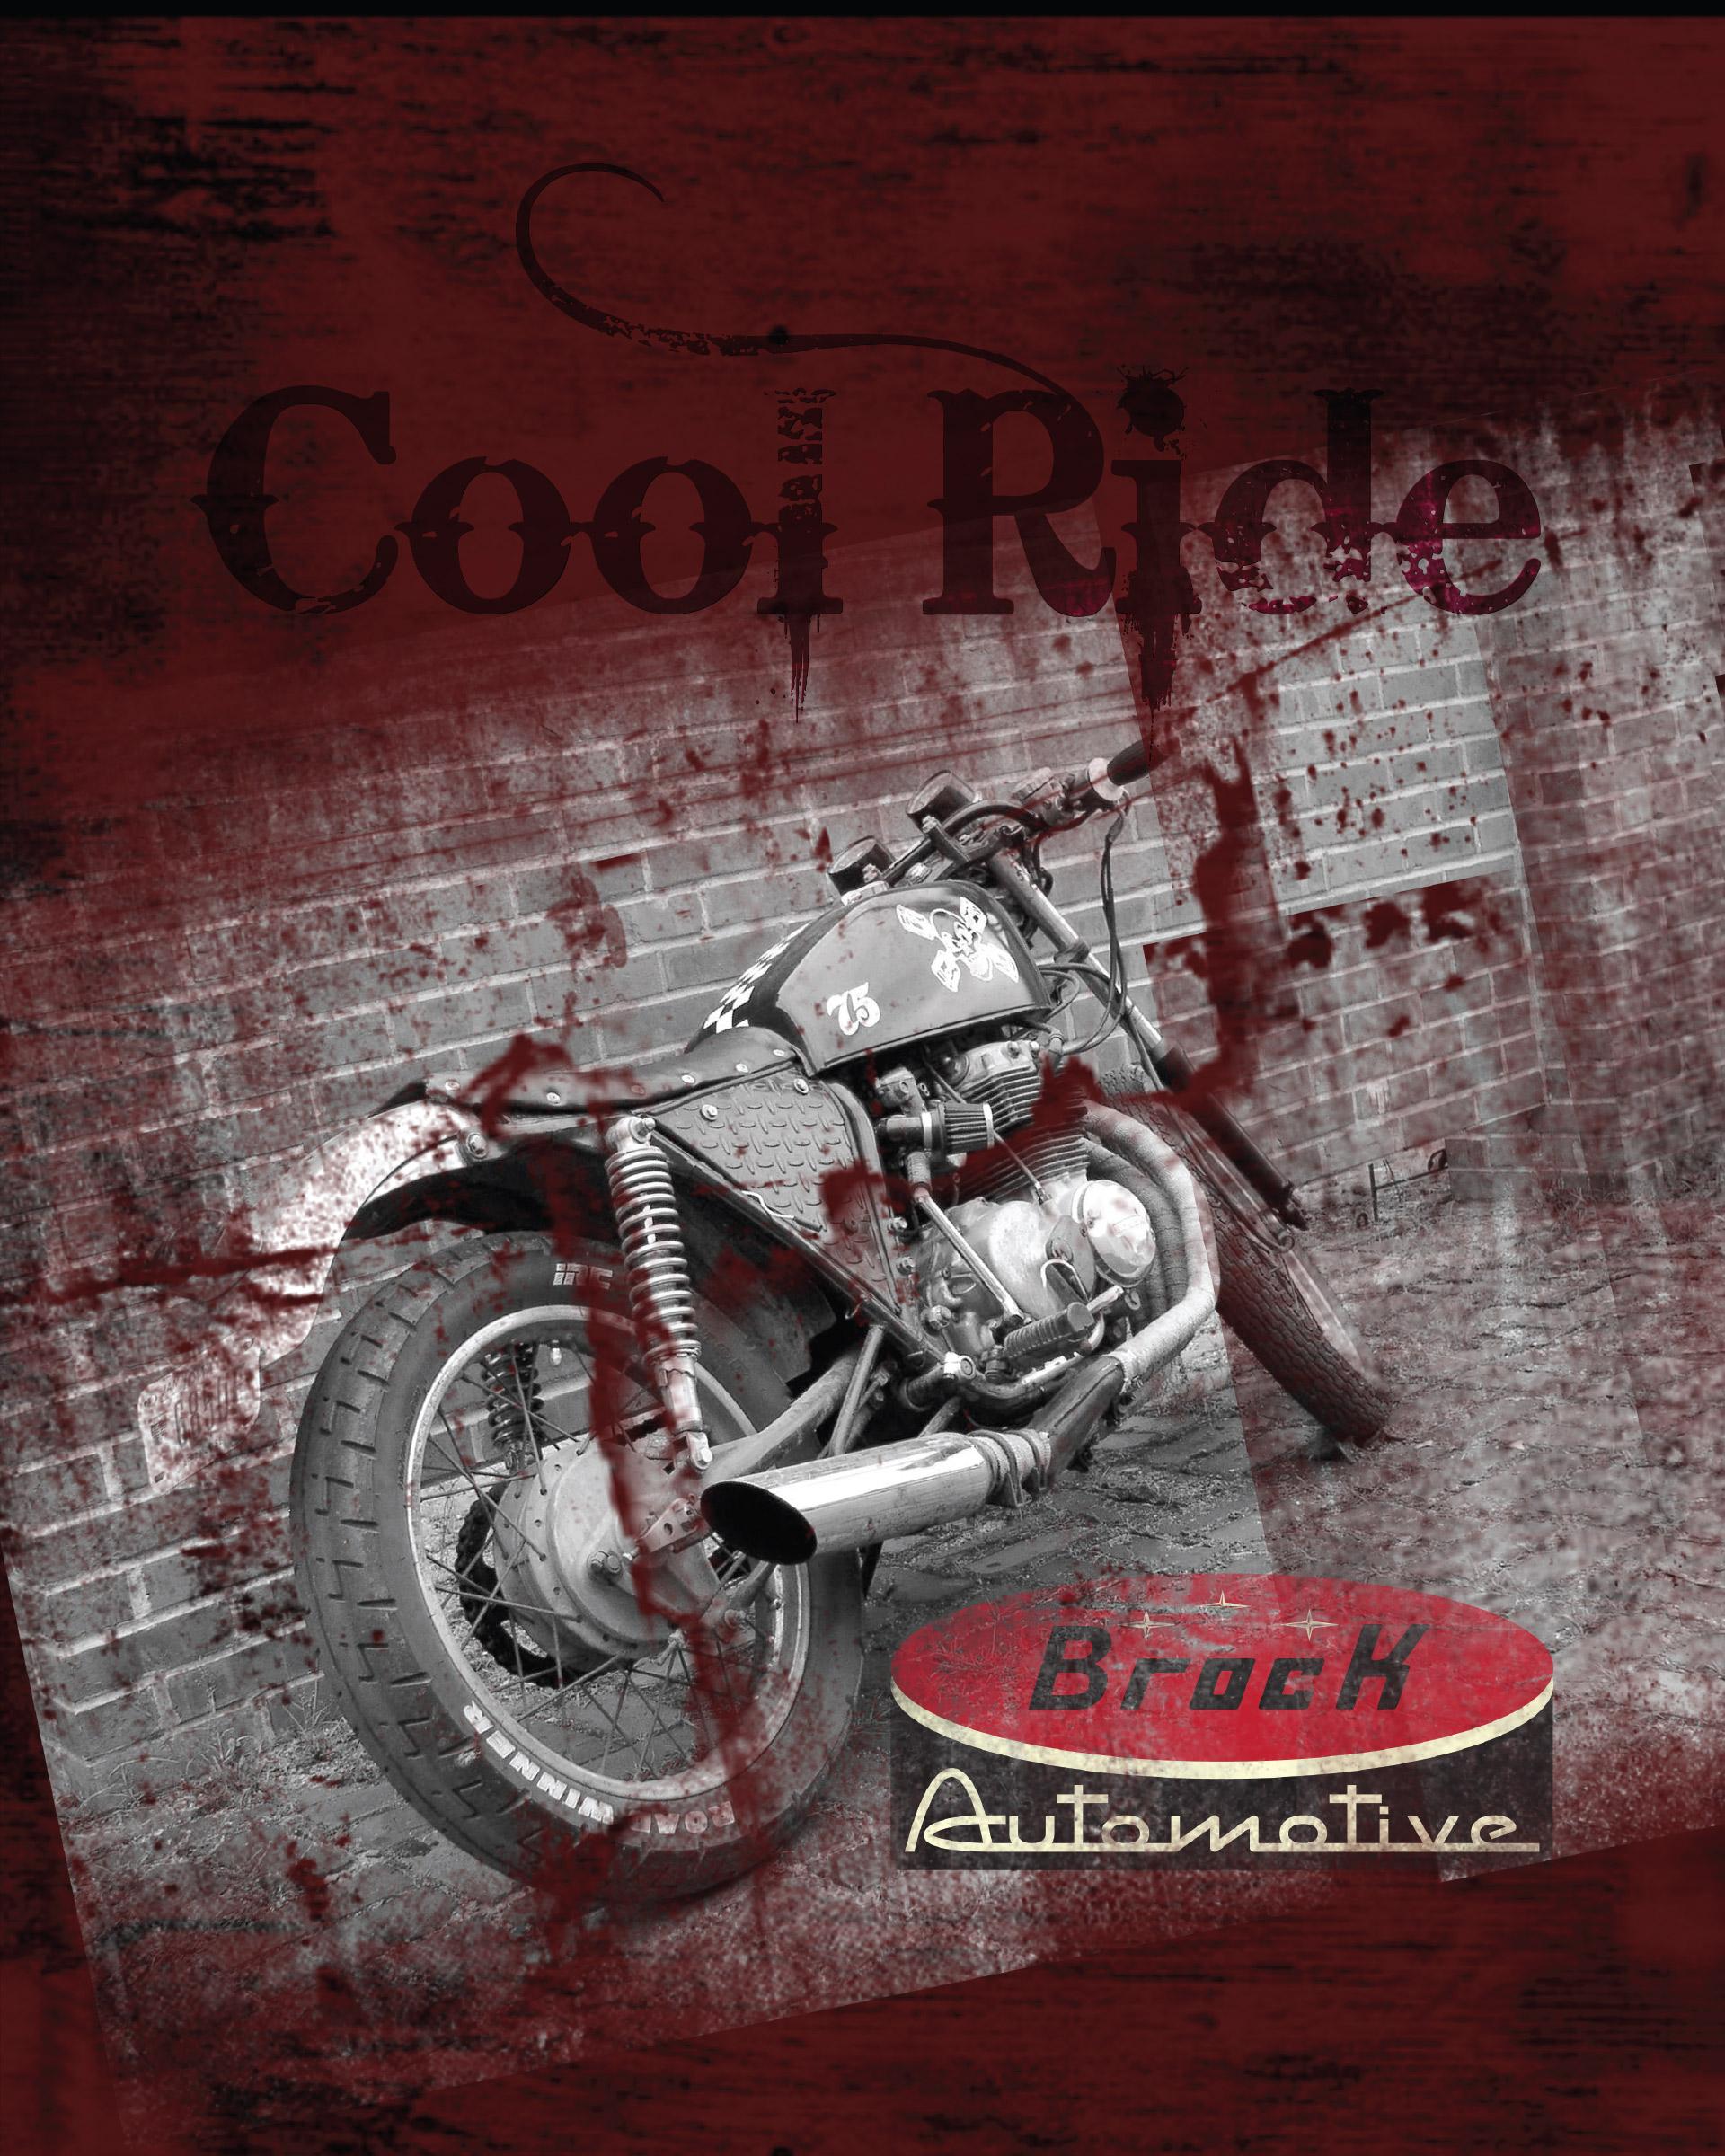 brock-auto-posters-coolride